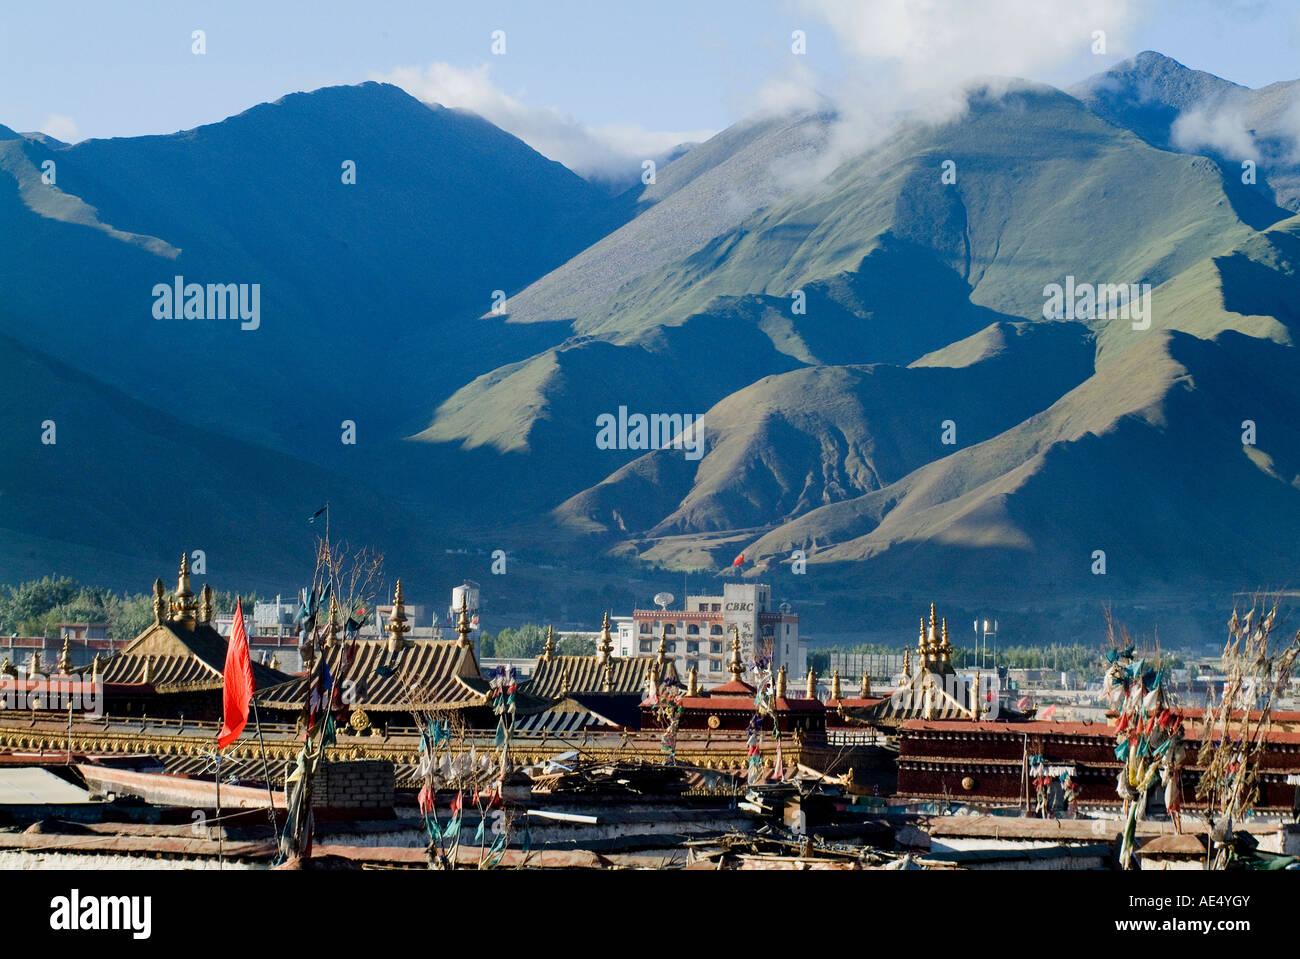 View over Lhasa, Tibet, China, Asia - Stock Image